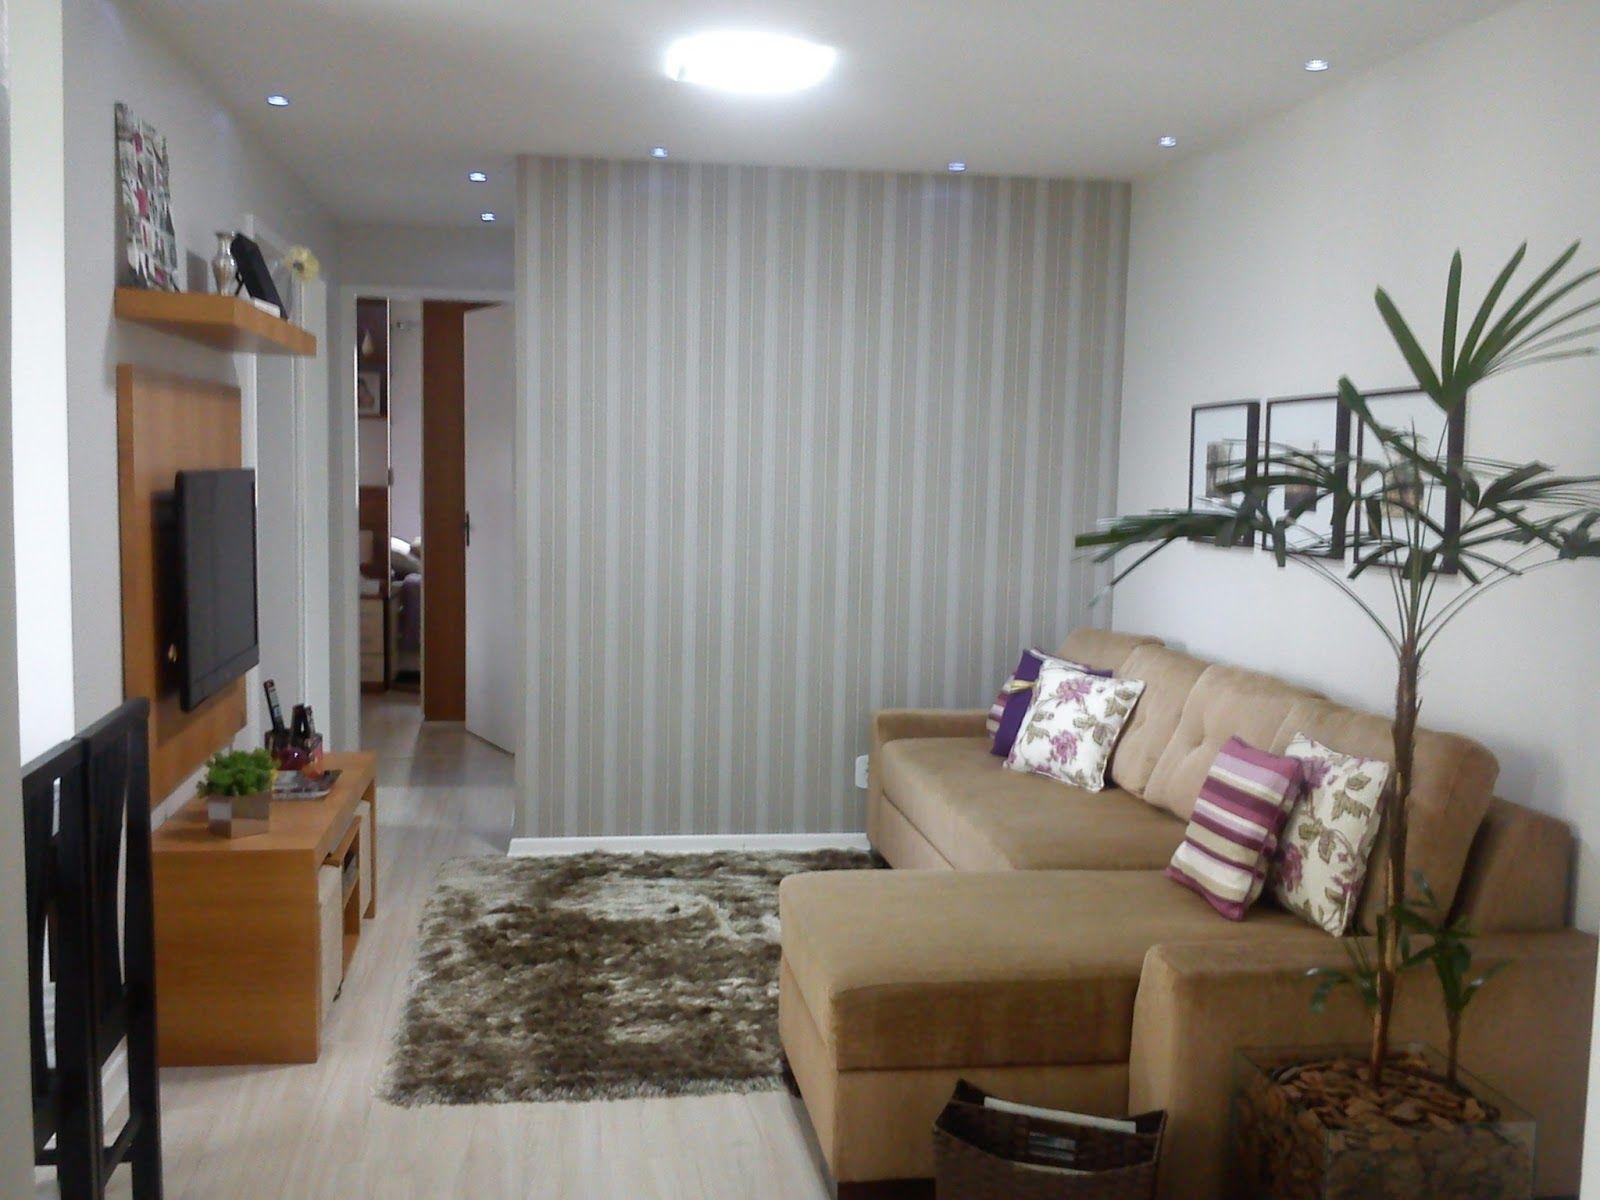 decoraç u00e3o sala de estar simples Pesquisa Google salas ideas Pinterest Small apartments  -> Decoração De Sala De Estar Pequena Simples E Barata